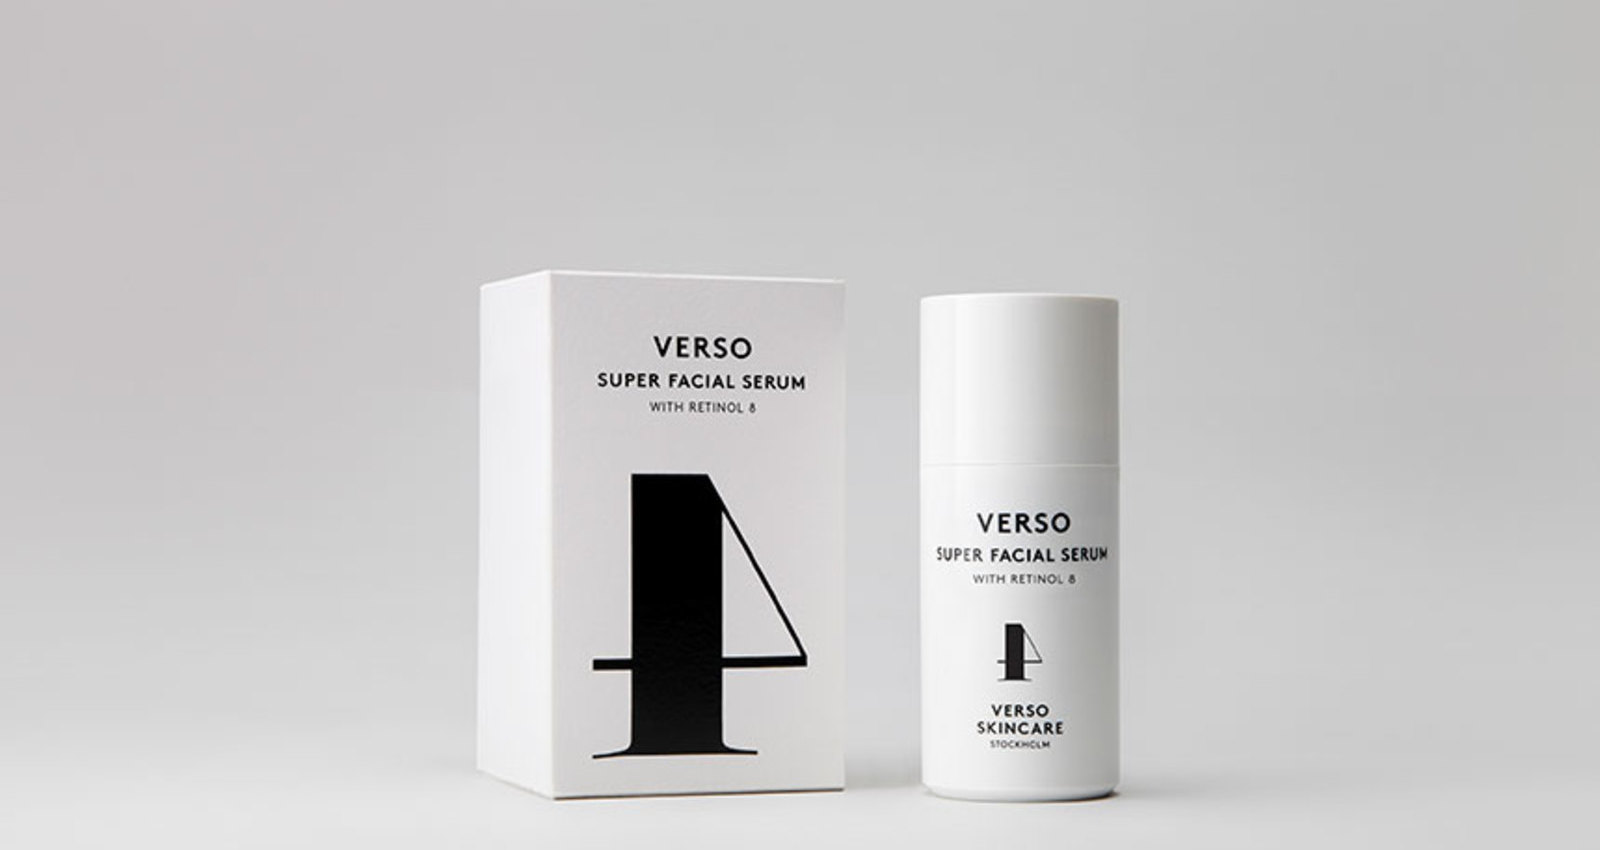 Verso Skincare